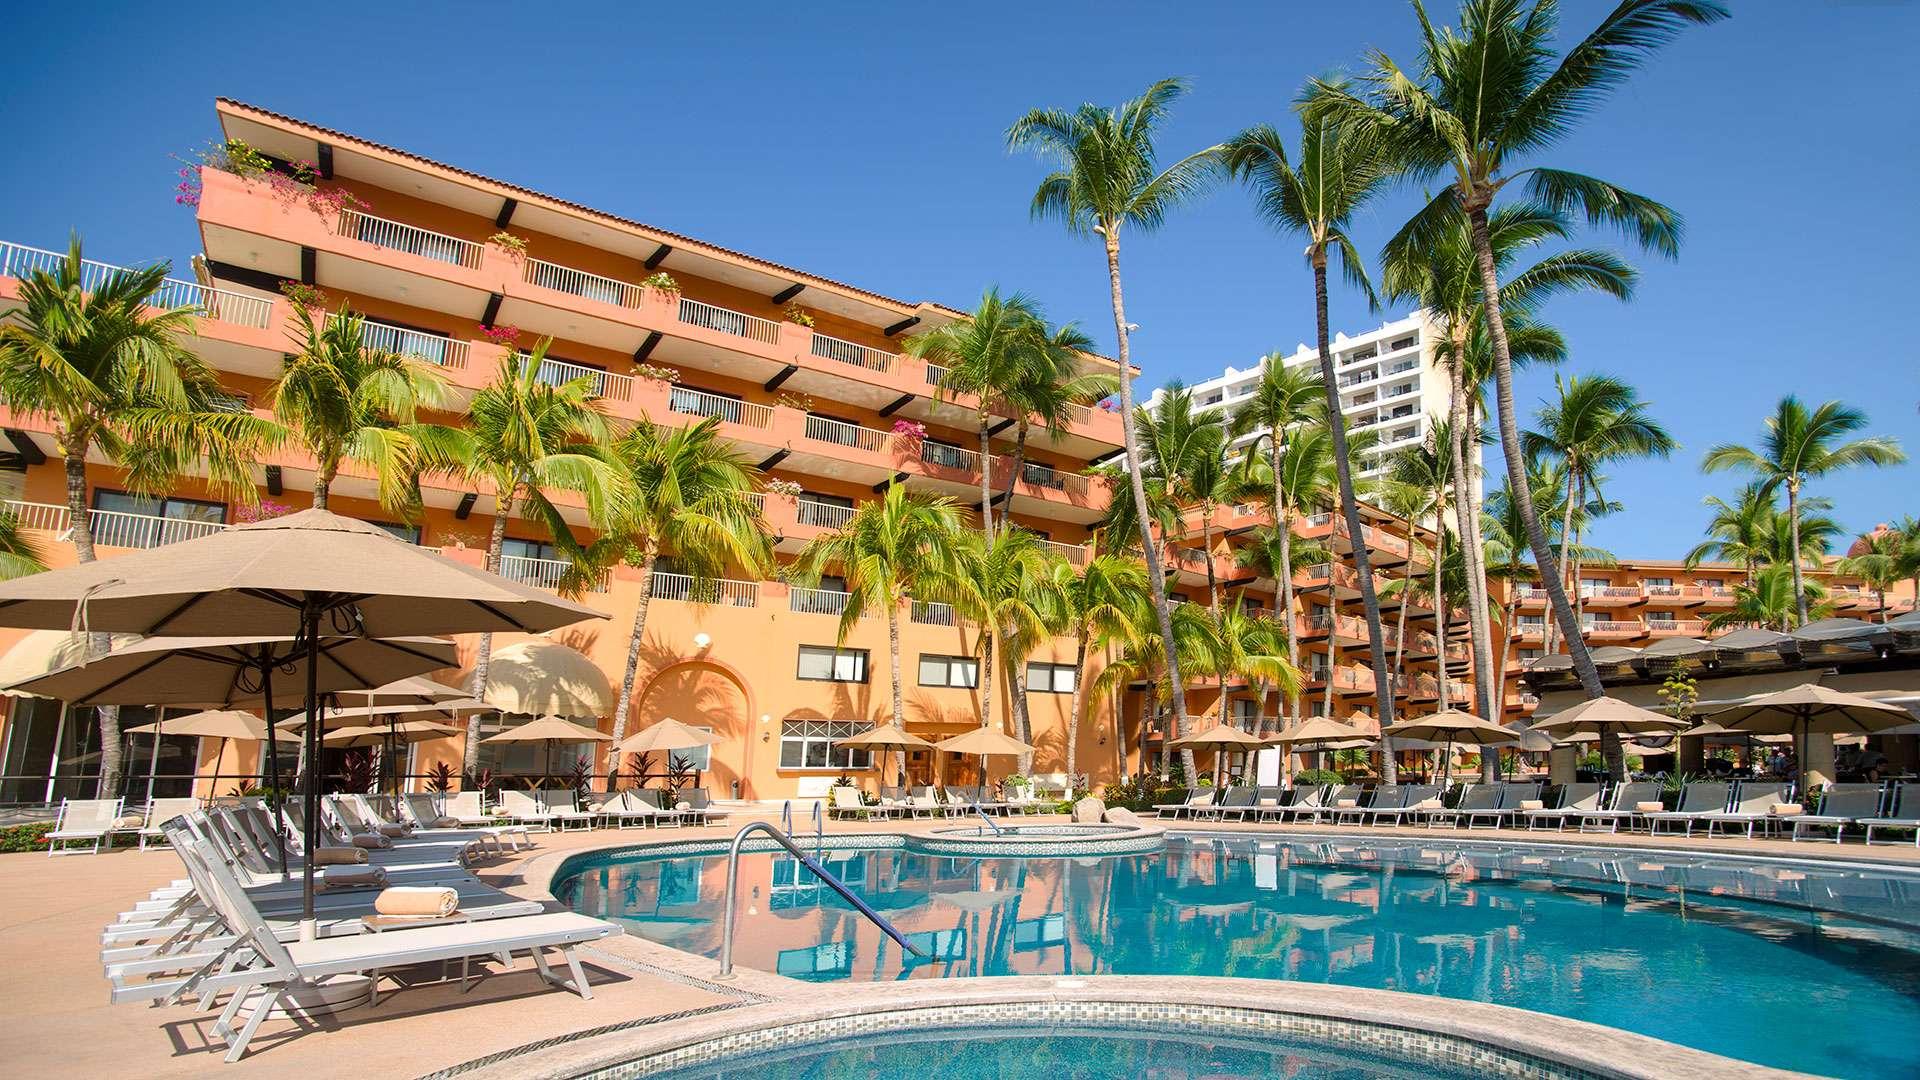 Optimizada villa del palmar puerto vallarta pool 003